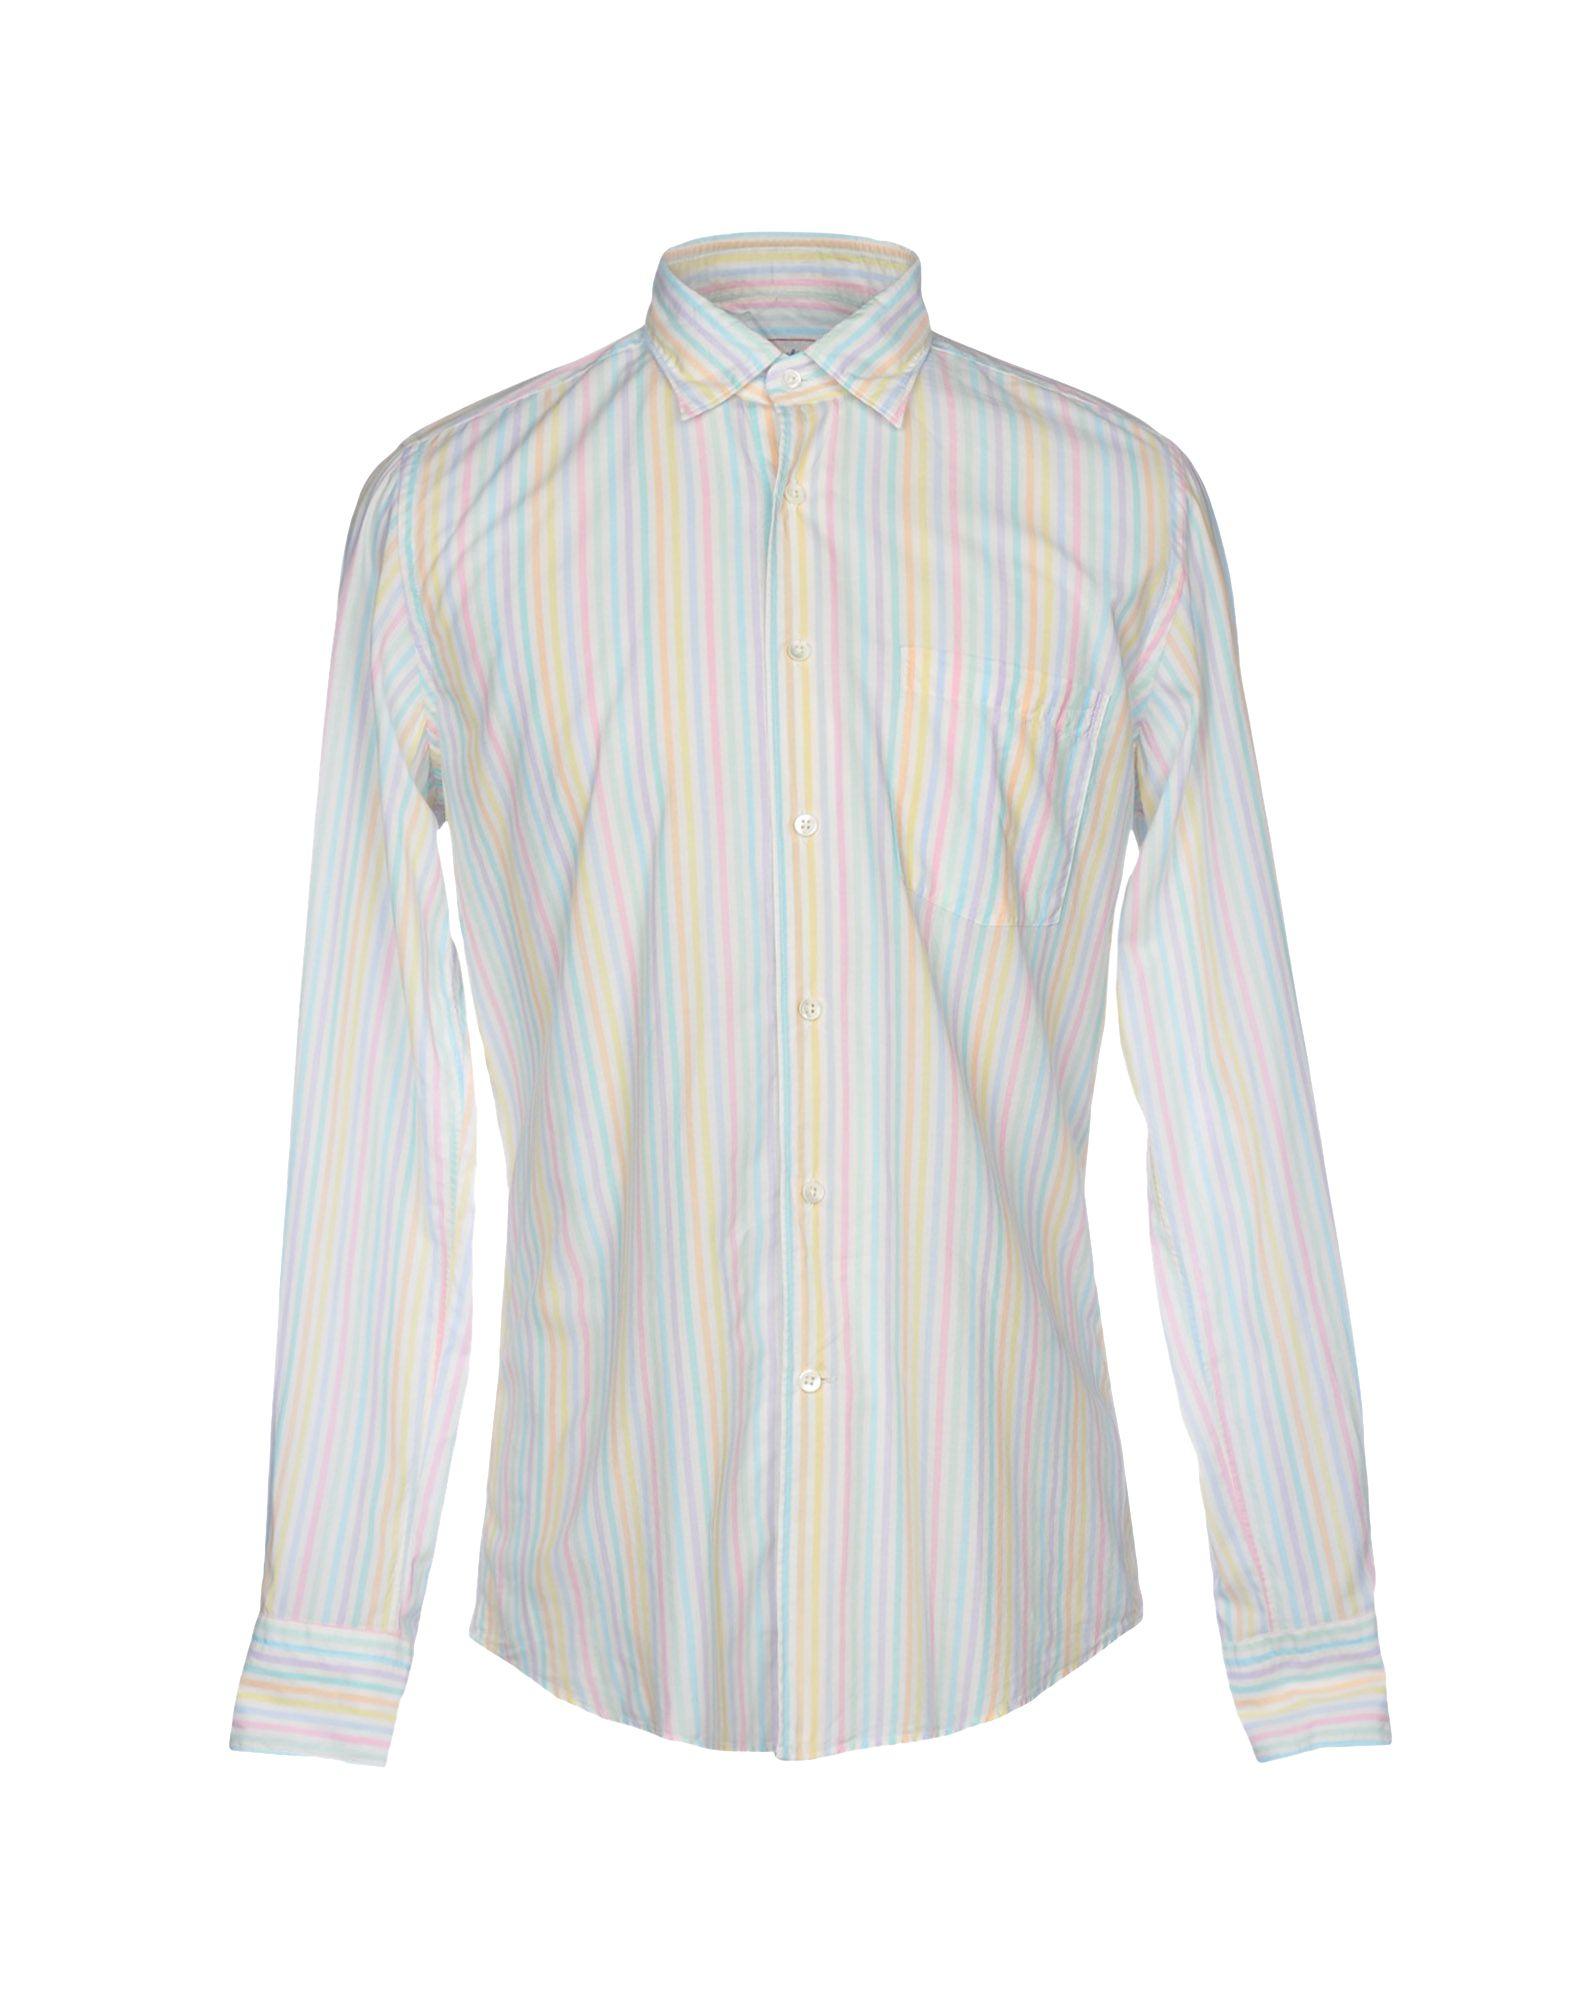 GLANSHIRT Striped Shirt in Sky Blue